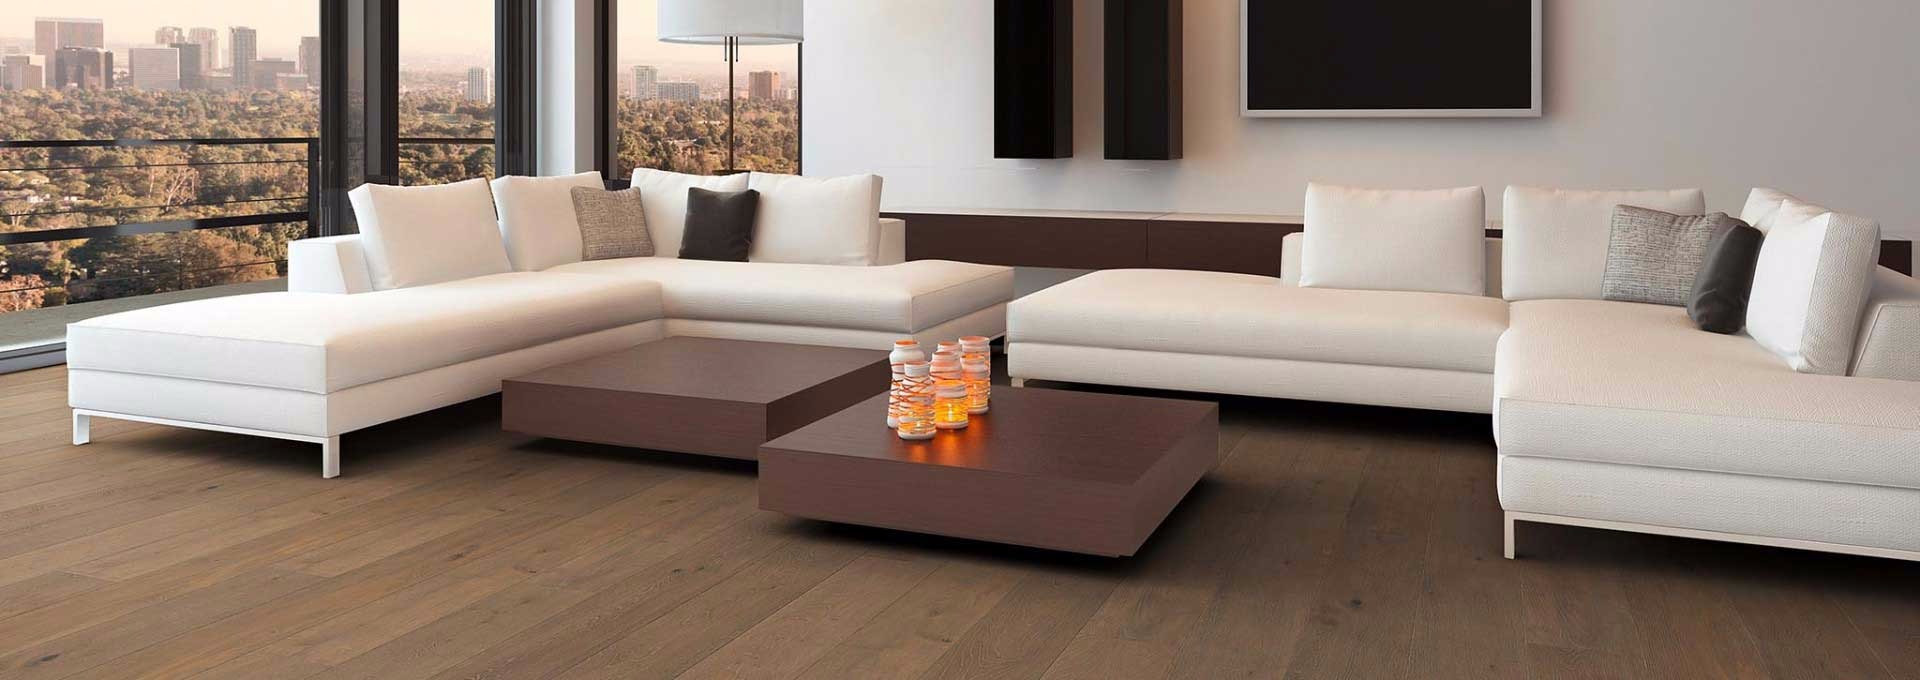 5 8 vs 3 4 hardwood flooring of wood flooring etx surfaces inside etx surfaces wood flooring commercial flooring